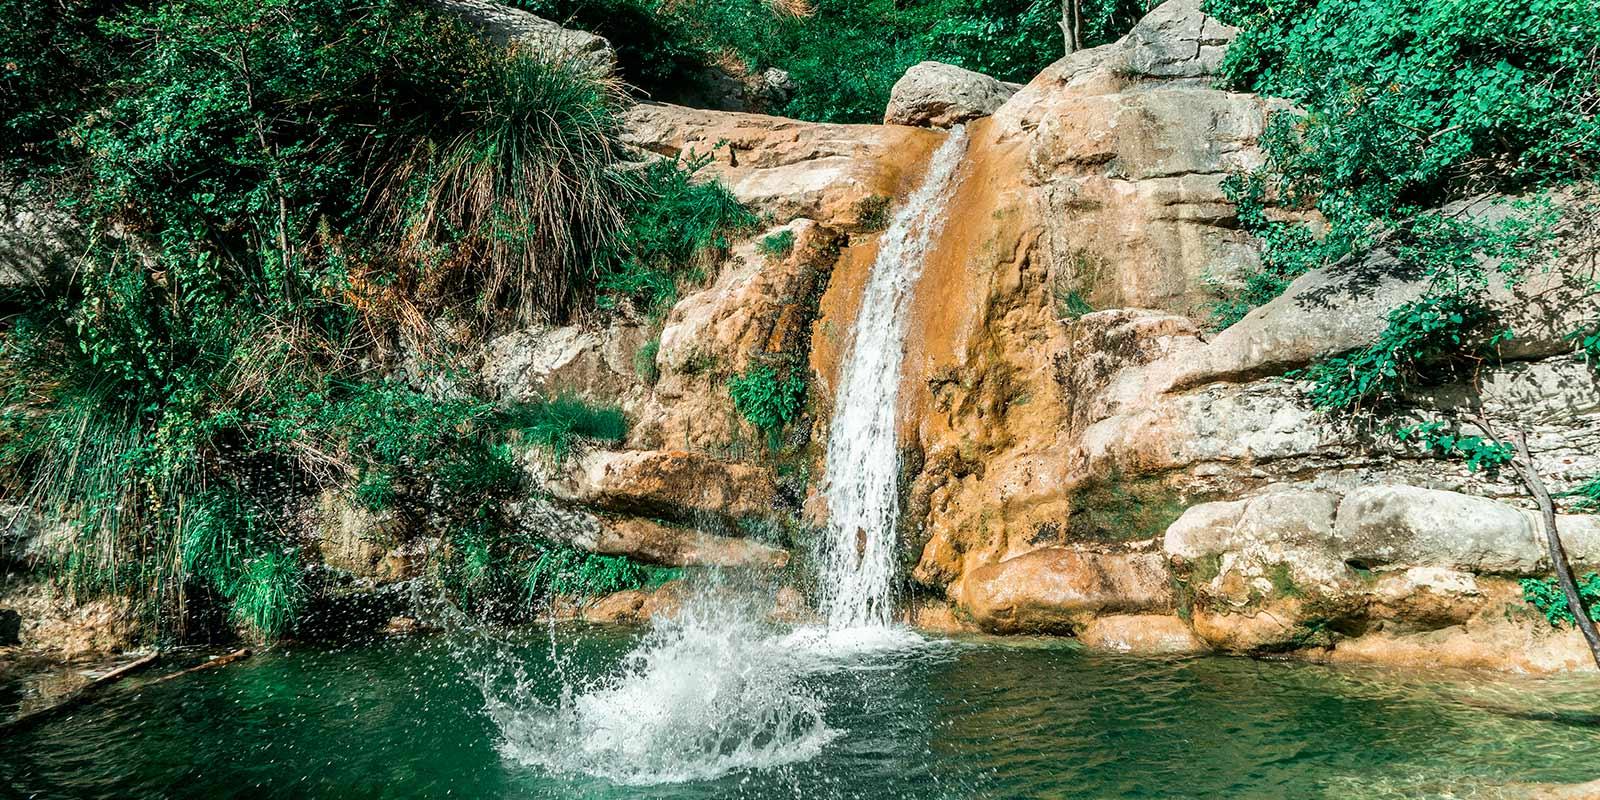 Take Me To The River #2 : Ruisseau de Redebraus